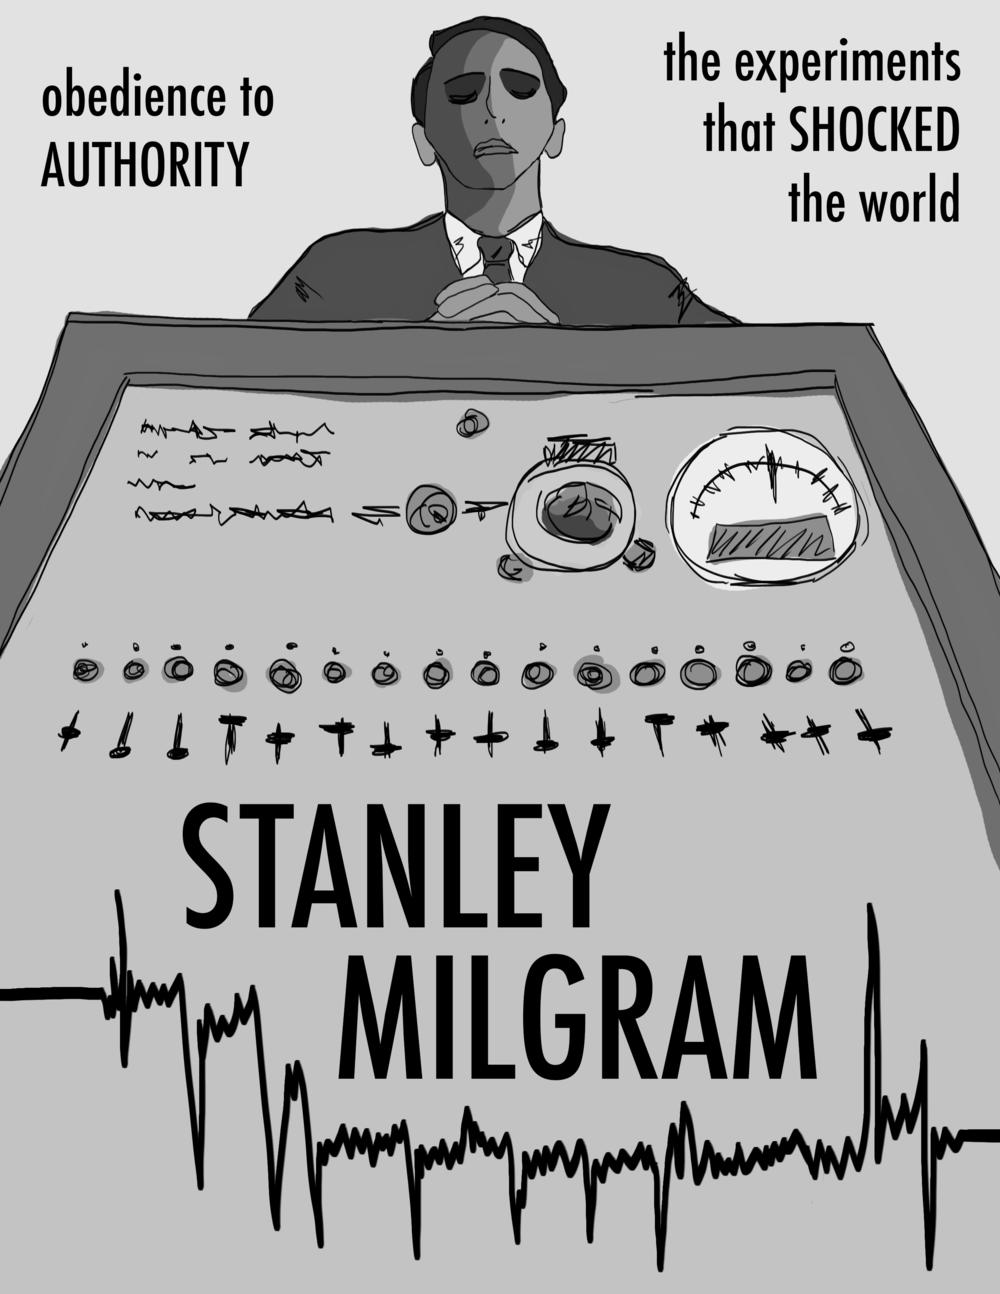 stanley milgram.png